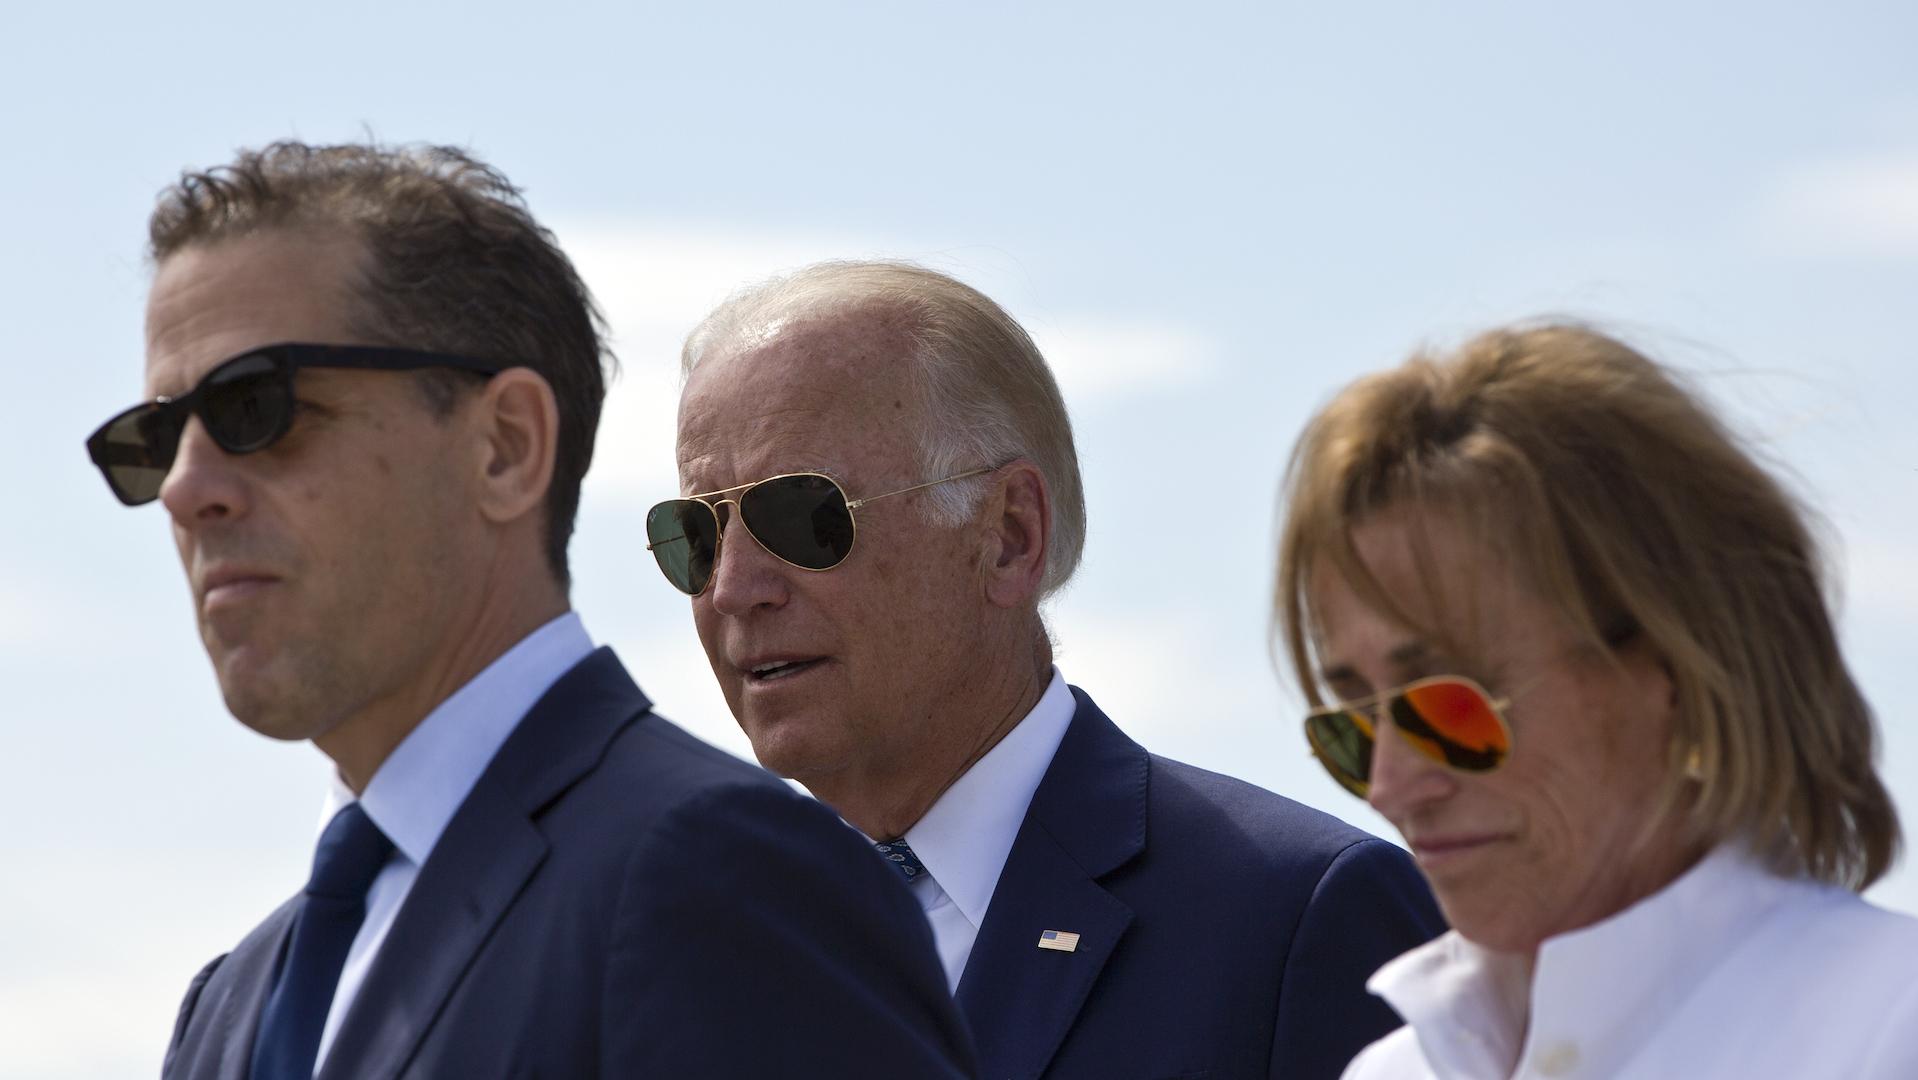 Scrutiny over Trump's Ukraine scandal may also complicate Biden's campaign